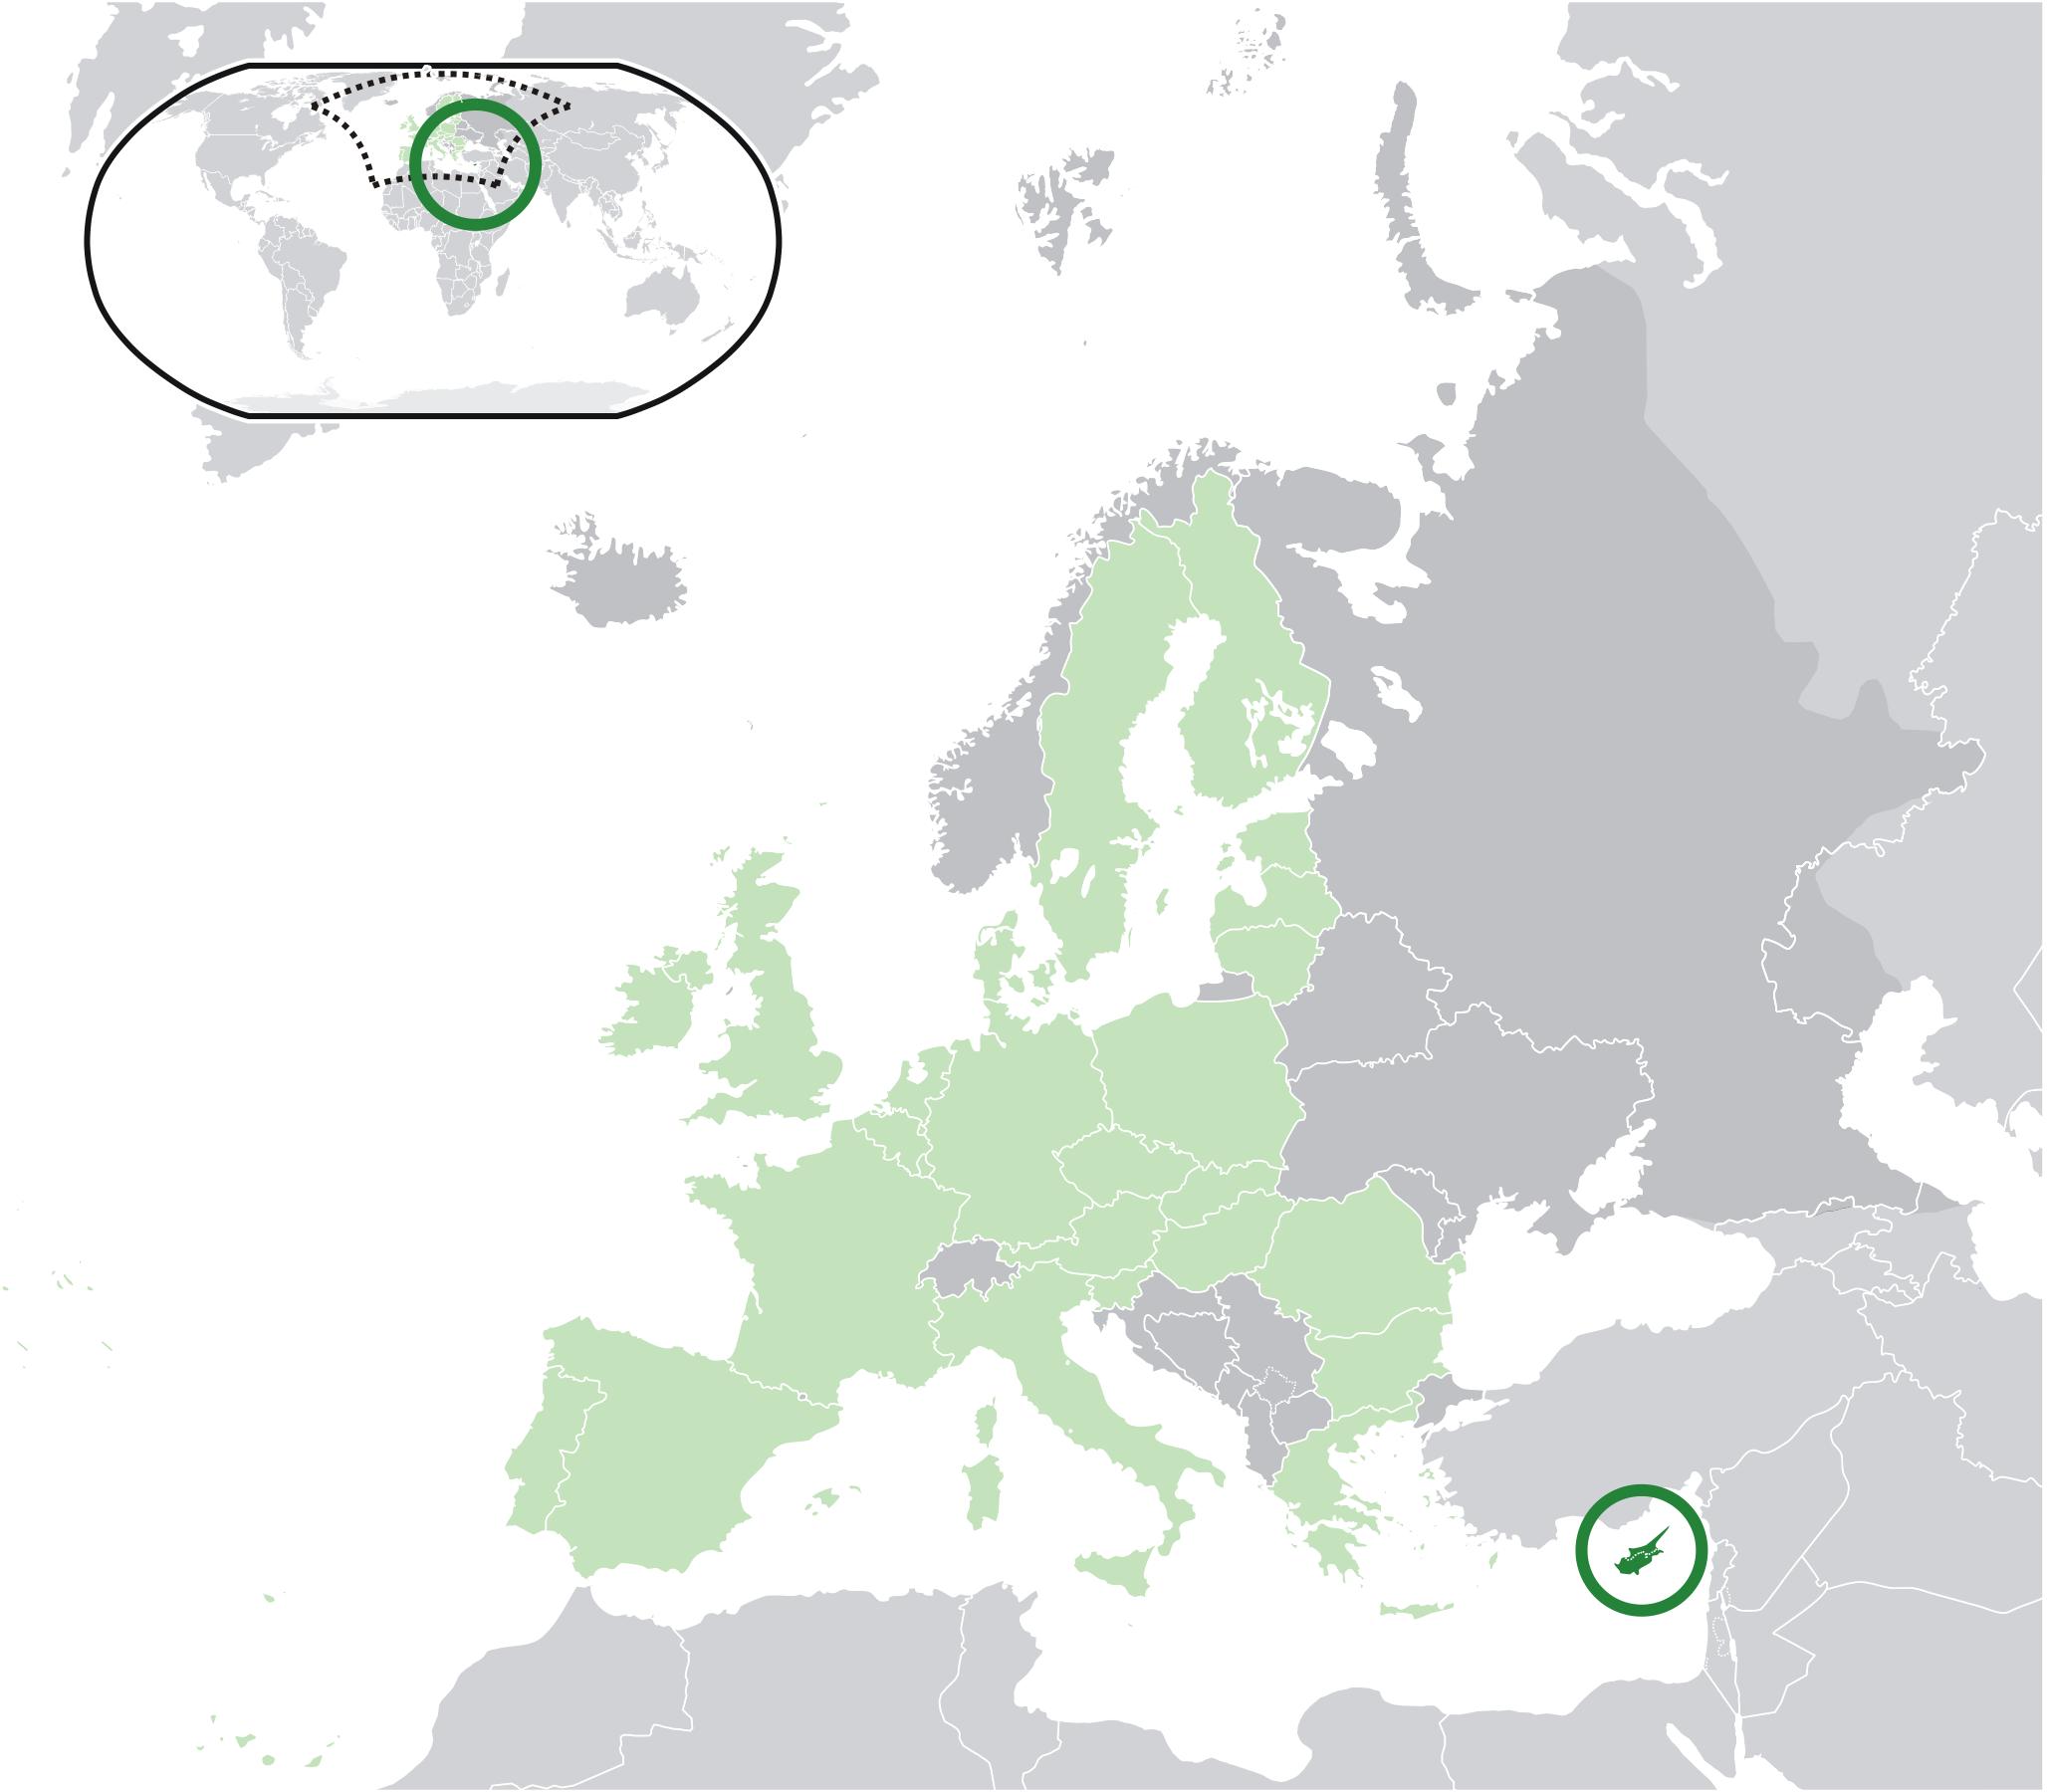 FileLocation Cyprus EU Europepng Wikimedia Commons